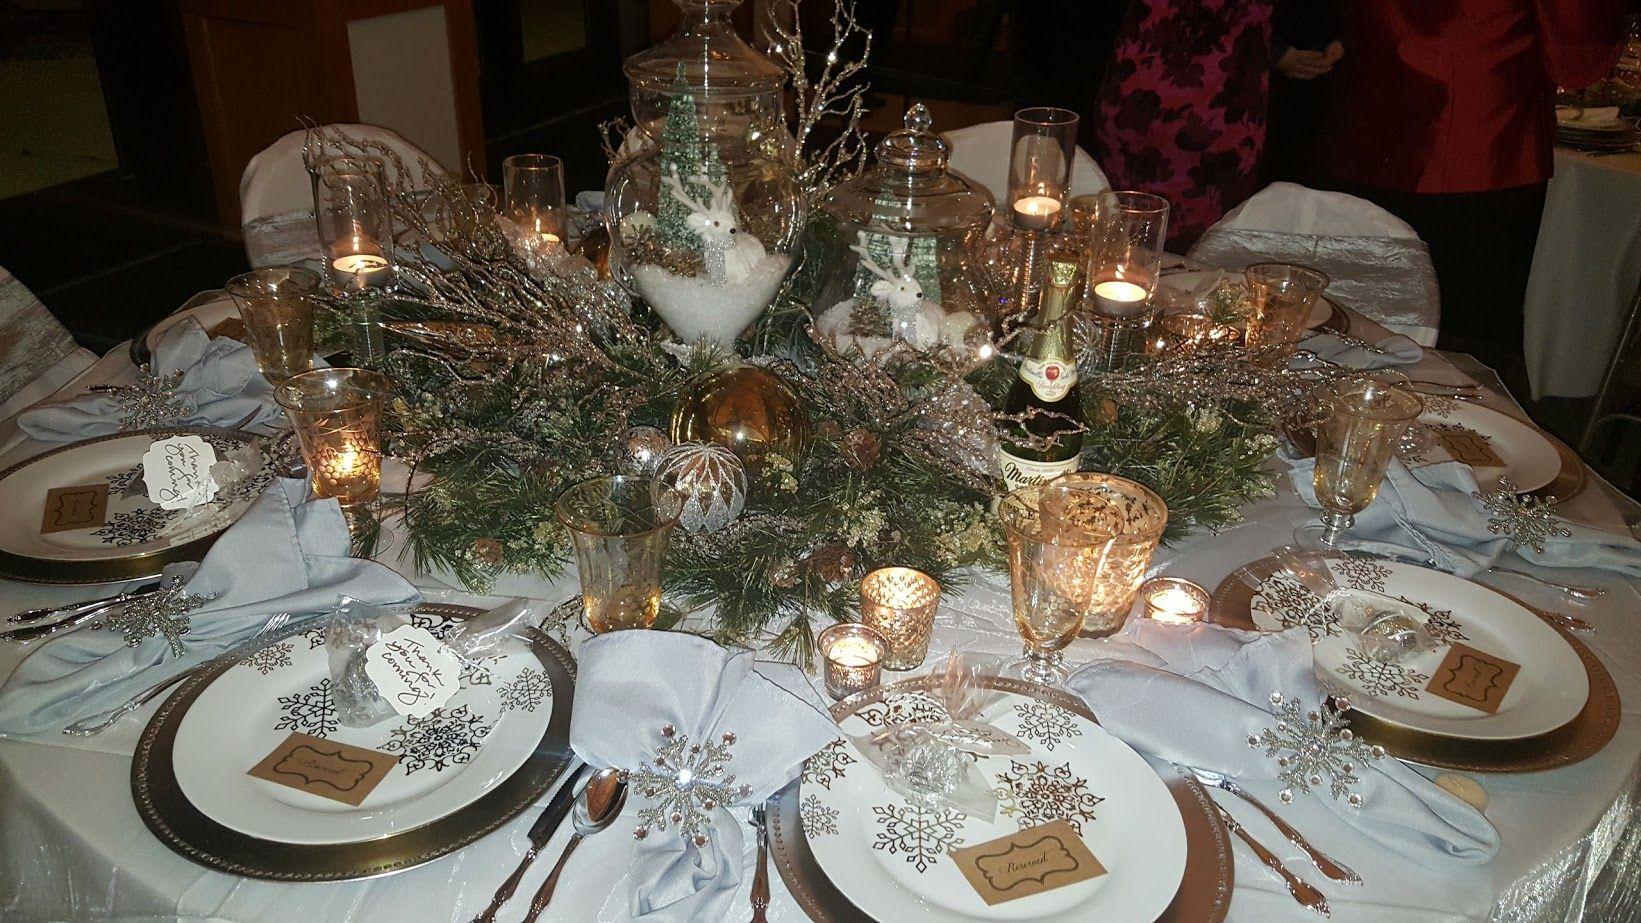 Lovely Winter Wonderland Christmas Table Setting Christmas Centerpieces Christmas Table Settings Winter Wonderland Decorations